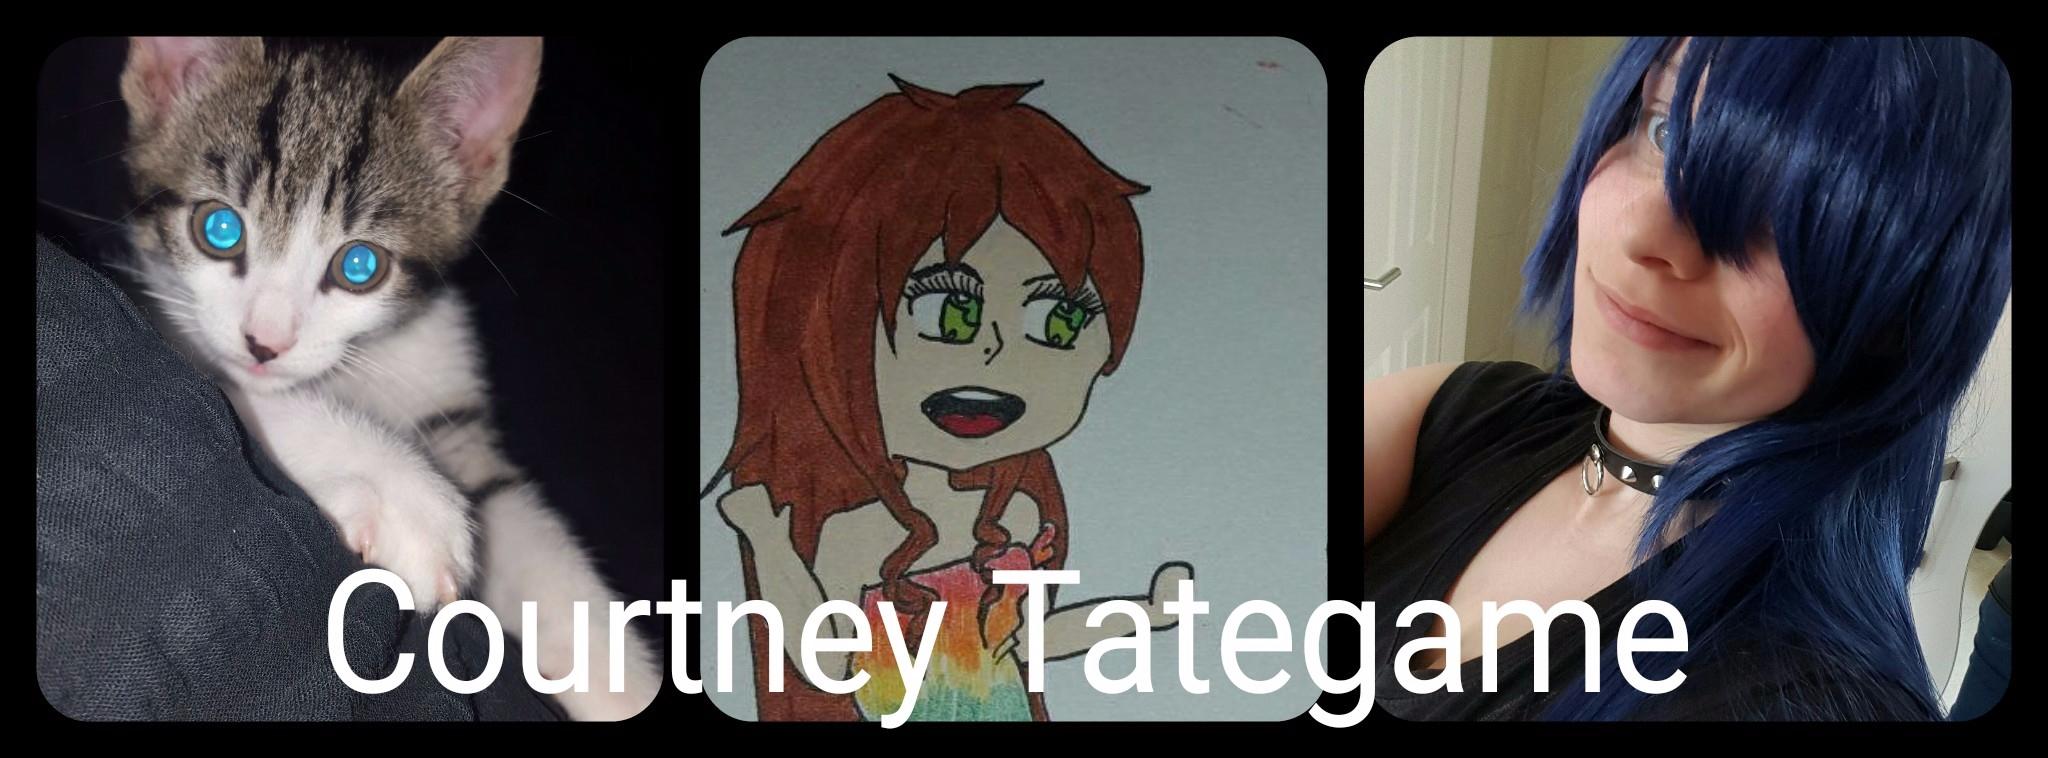 Courtney tategame (@courtney_tategame) Cover Image